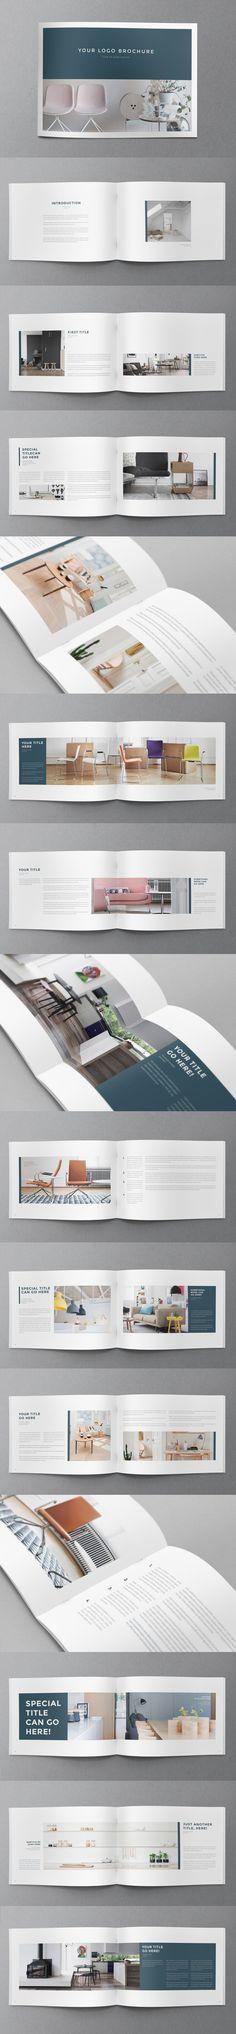 36 Ideas Design Layout Booklet Portfolio Ideas For 2019 Layout Design, Graphic Design Layouts, Print Layout, Web Design, Mise En Page Portfolio, Portfolio Layout, Portfolio Design, Portfolio Web, Brochure Indesign